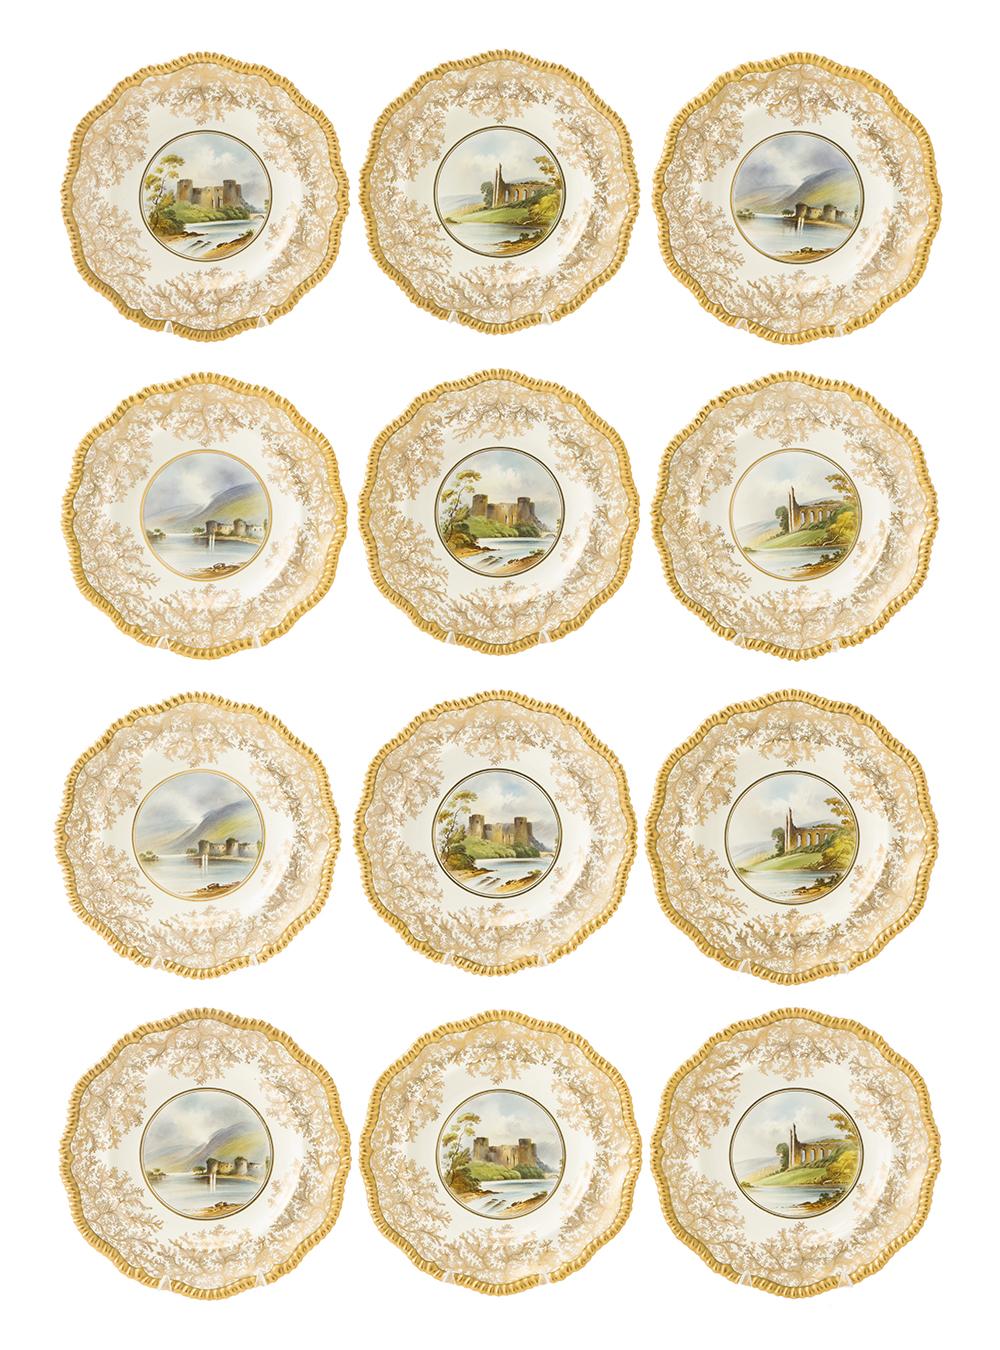 Lot 38 - Twelve Copeland Spode plates